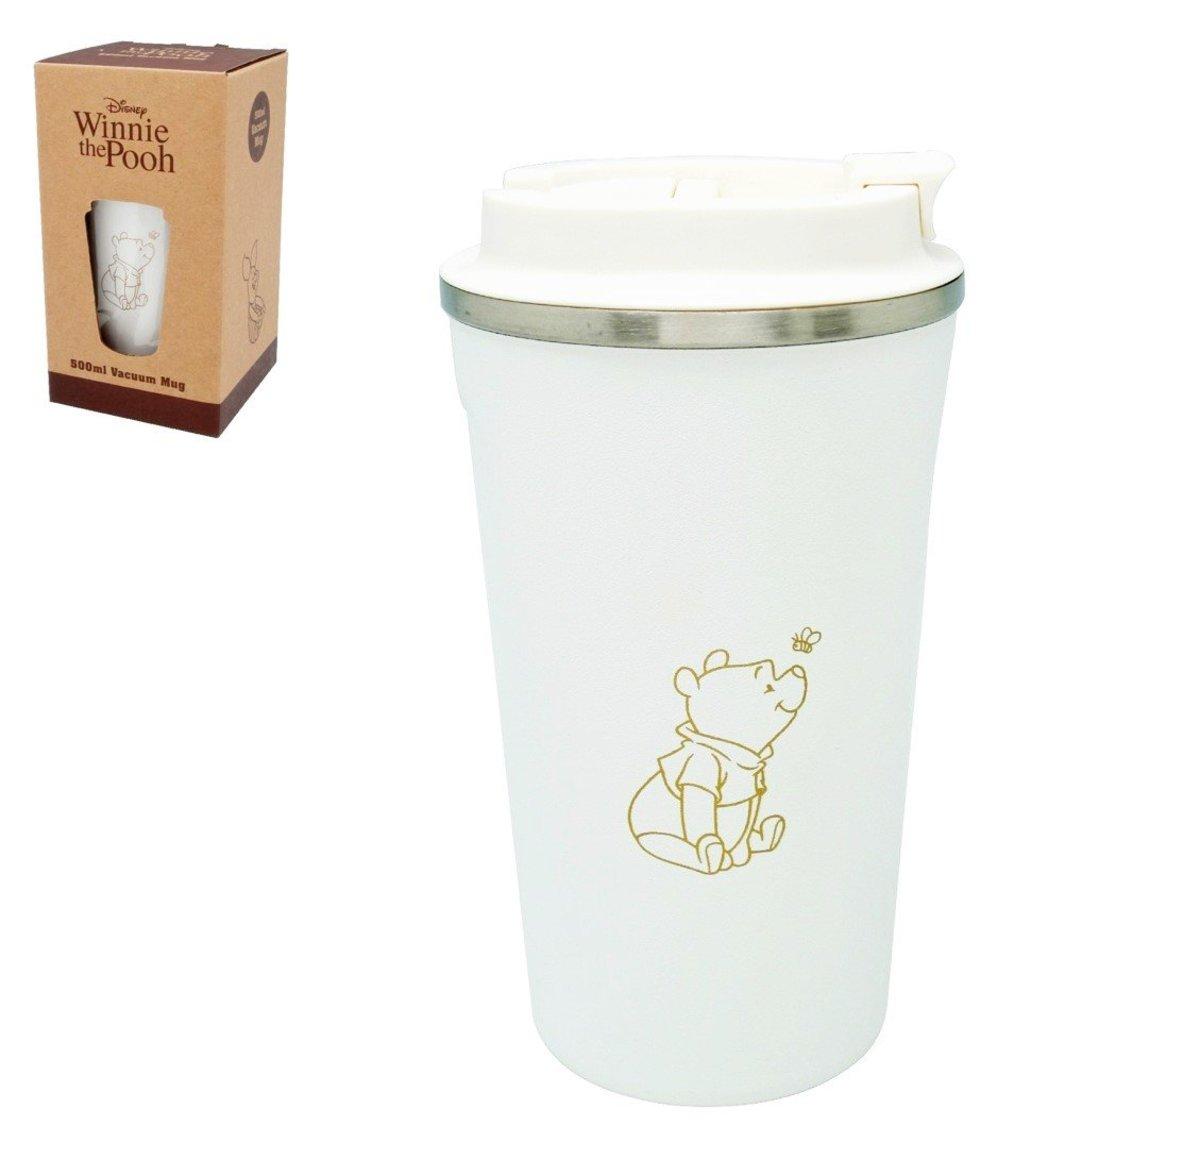 Disney迪士尼 --真空冷熱咖啡保溫杯 (500ml) (迪士尼許可產品)